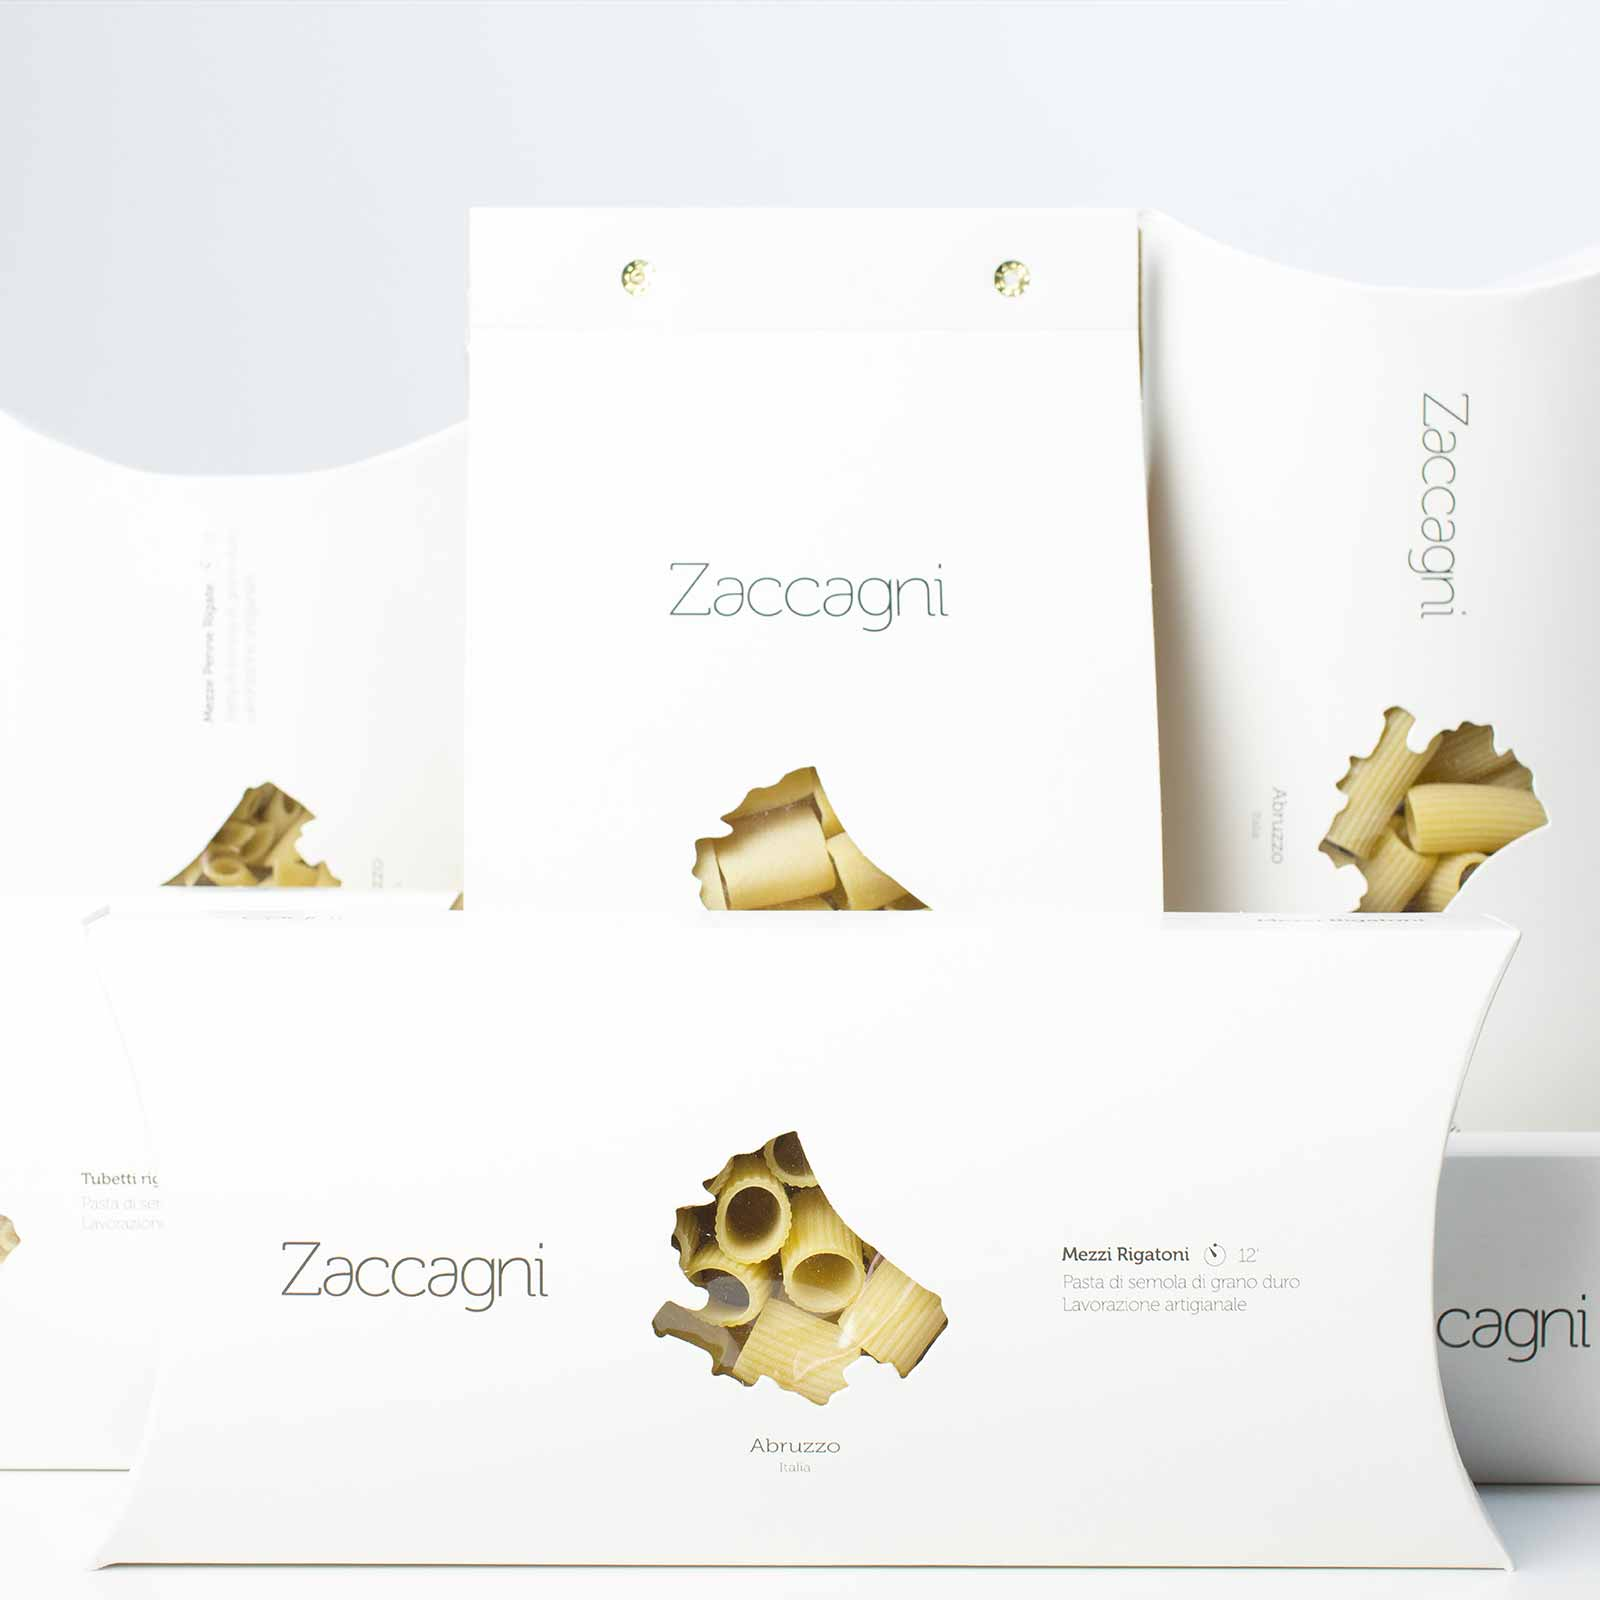 Dispenser - Packaging - Zaccagni